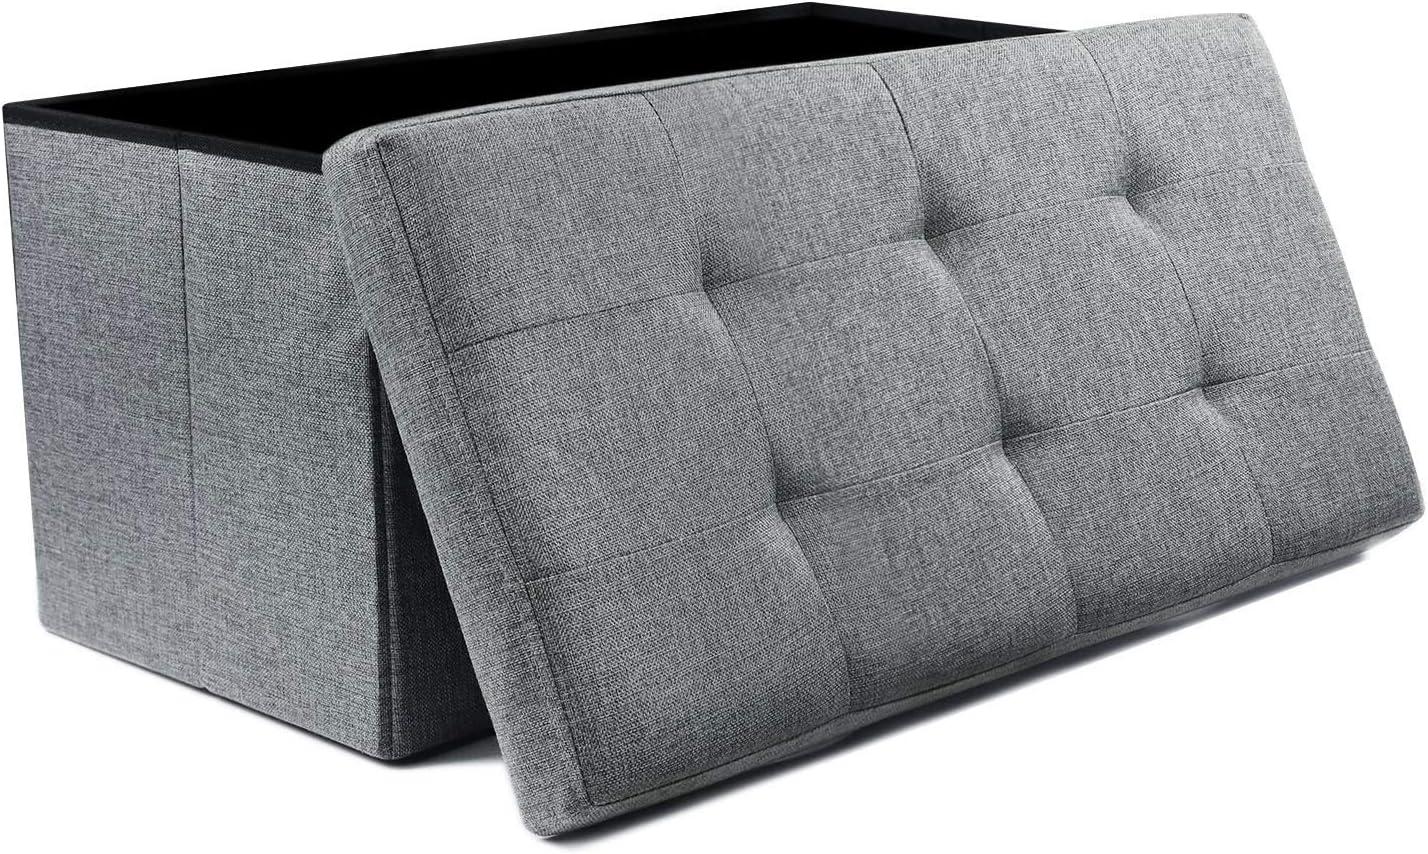 NISUNS Sales results No. 1 OT03 30 Inch Linen Storage Foldable Fabric Bench Ottoman Latest item